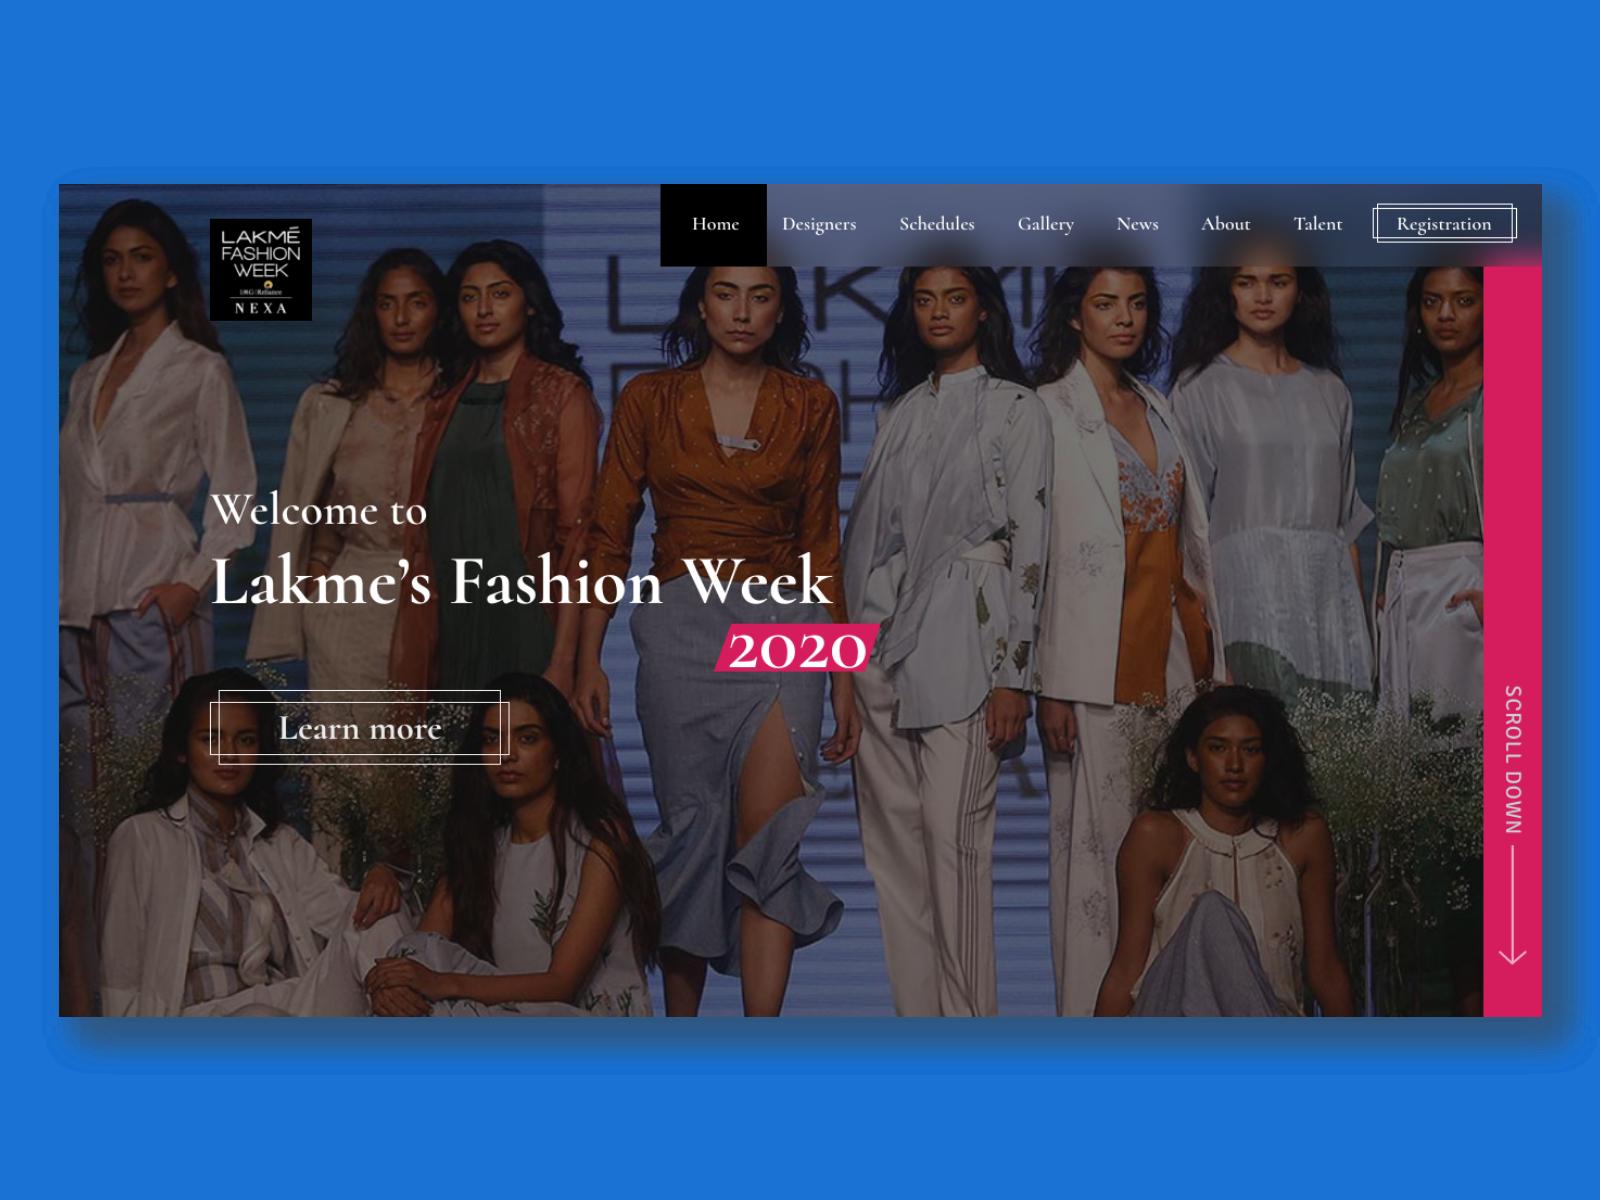 Lakme S Fashion Week By Rushabh Pathak On Dribbble